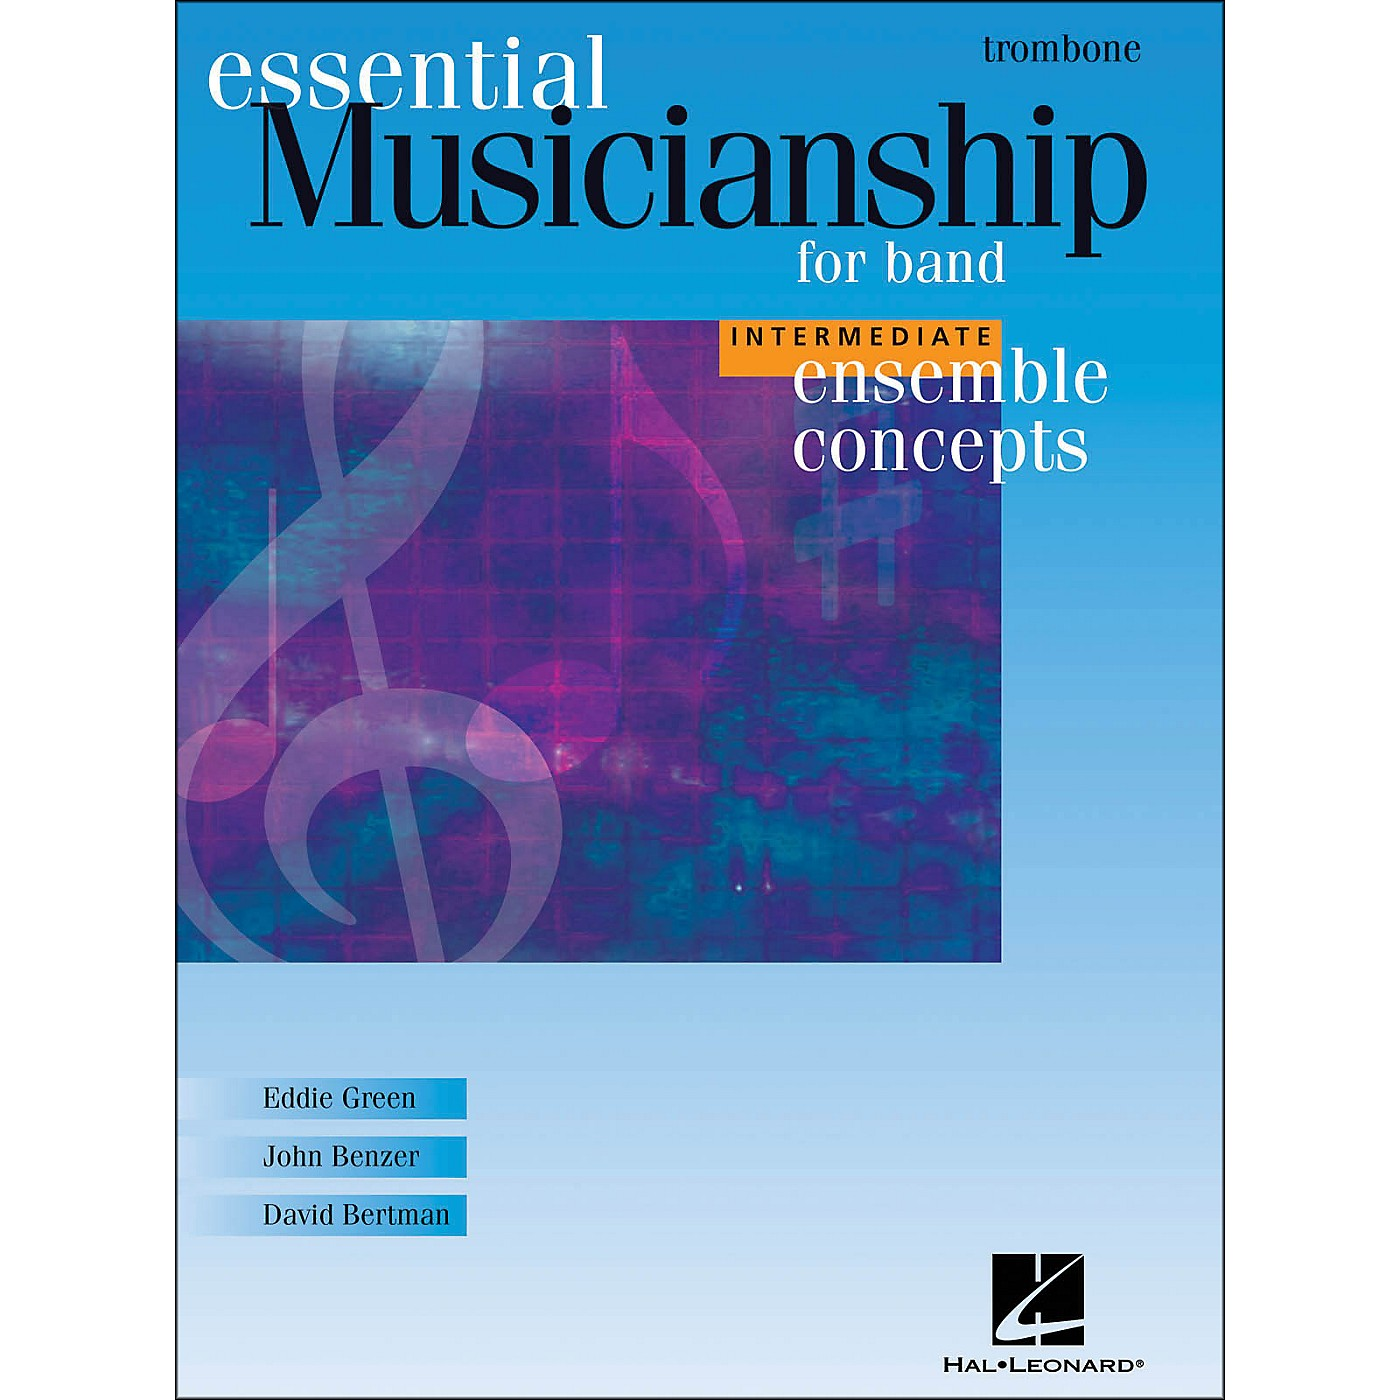 Hal Leonard Ensemble Concepts for Band - Intermediate Level Trombone thumbnail